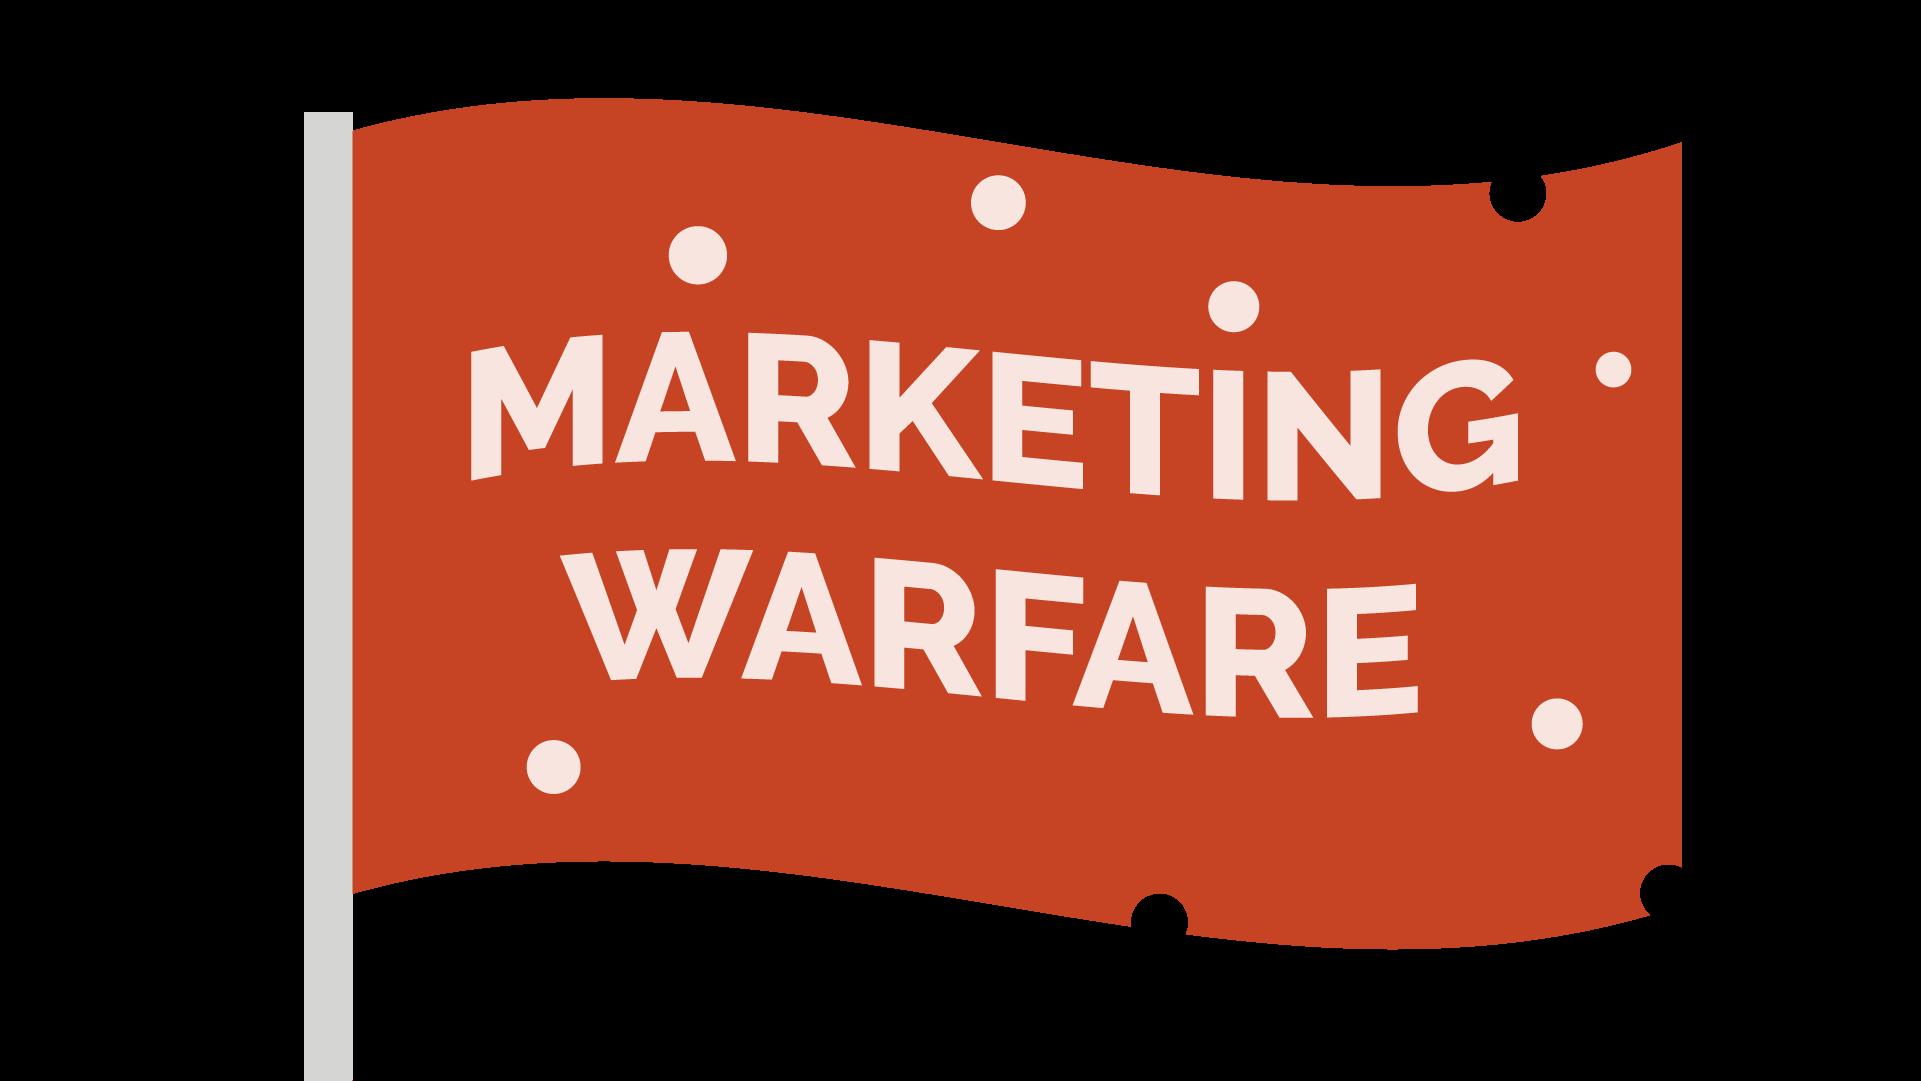 marketing warfare - orange flag full of bullet holes that reads 'Marketing Warfare'